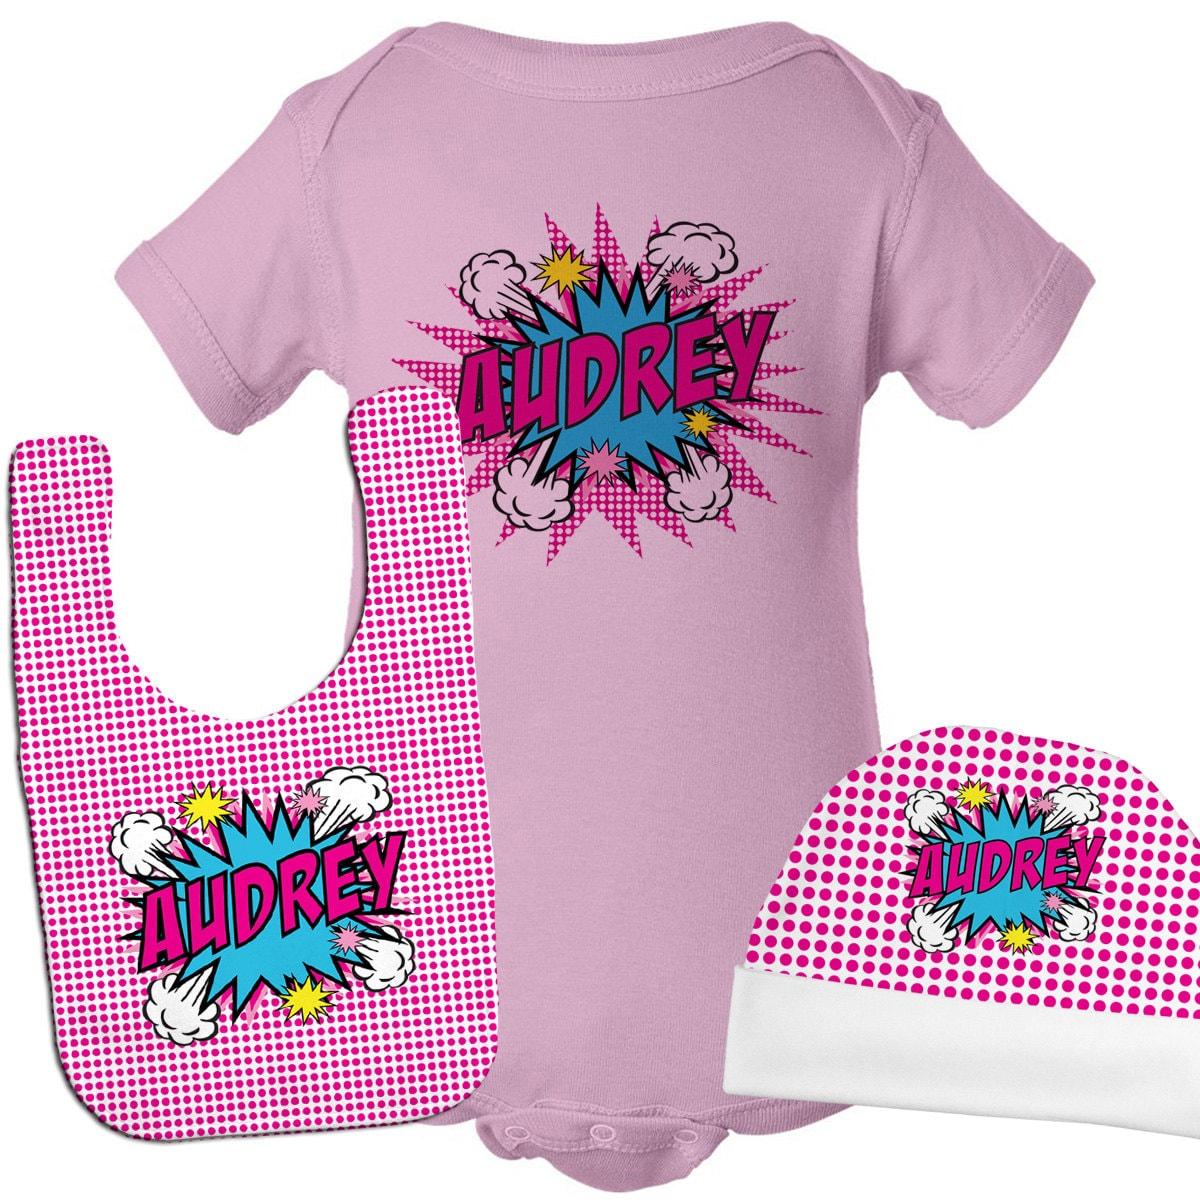 Personalised Baby Gift Sets : Personalized baby gift set superhero girl newborn